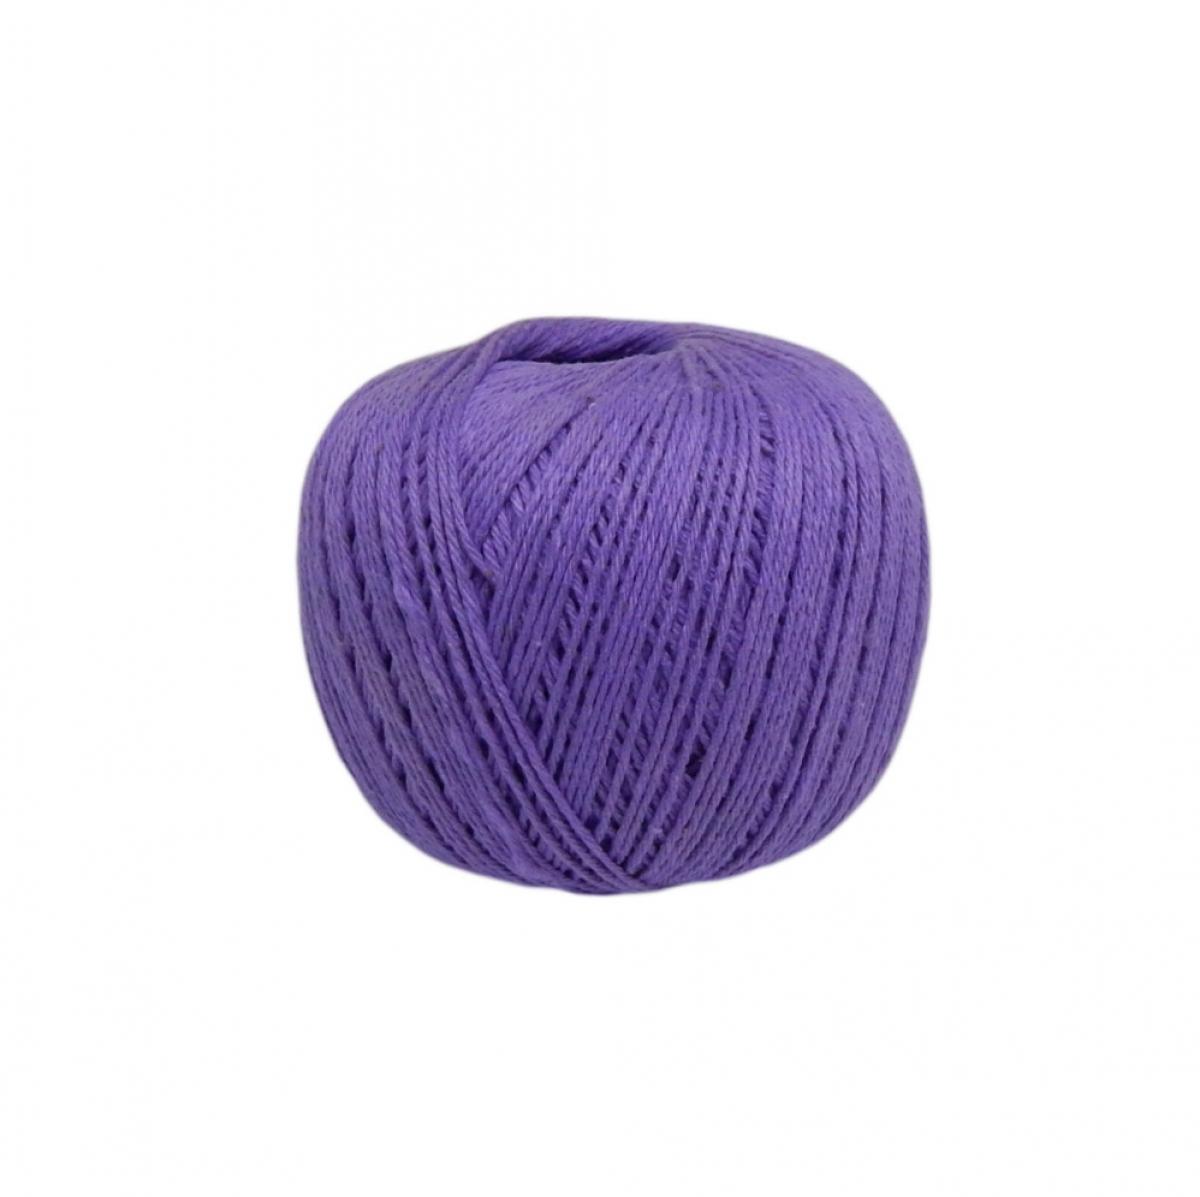 Viola light-purple